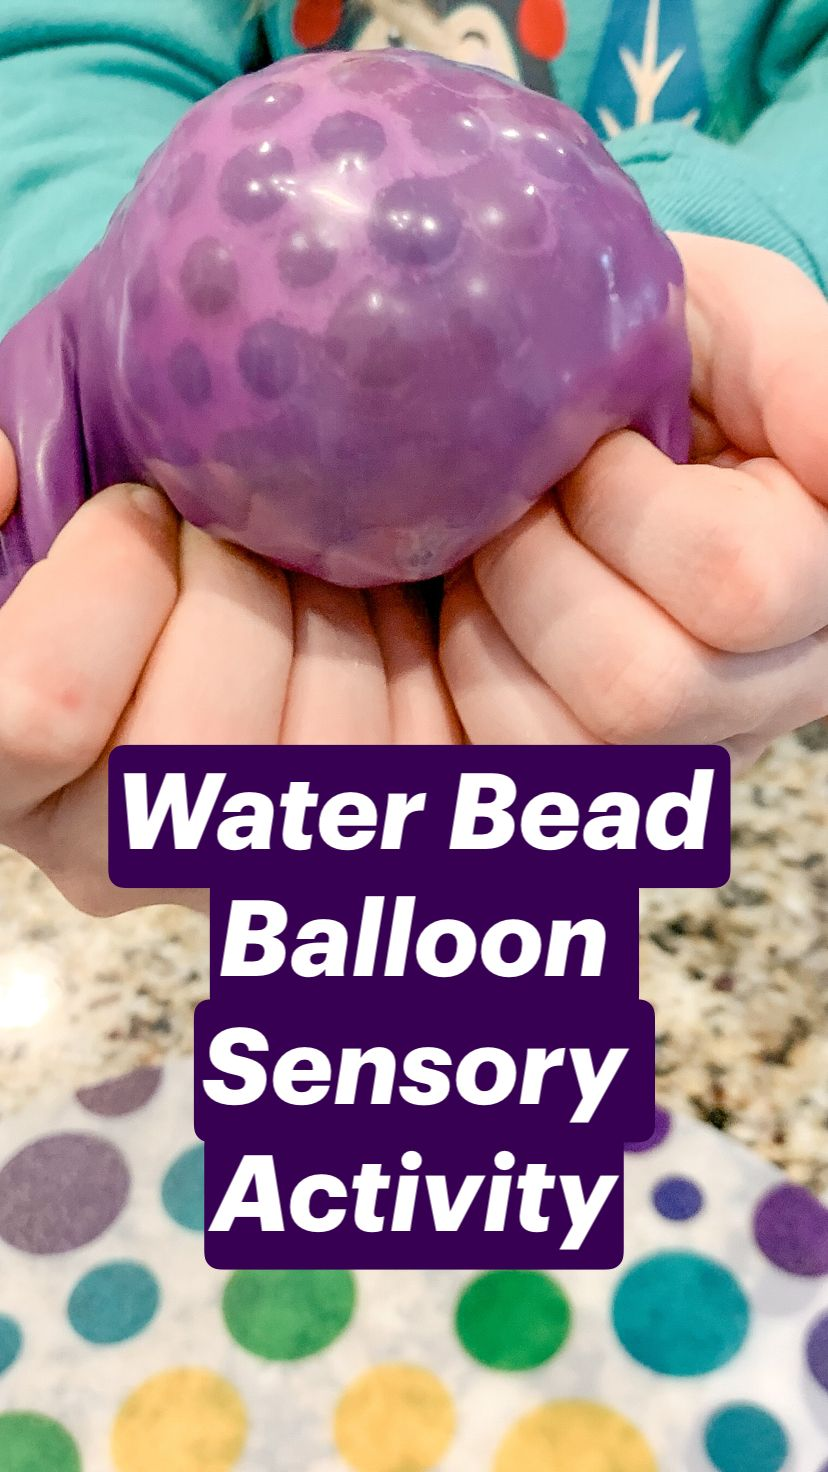 Water Bead Balloon Sensory Activity